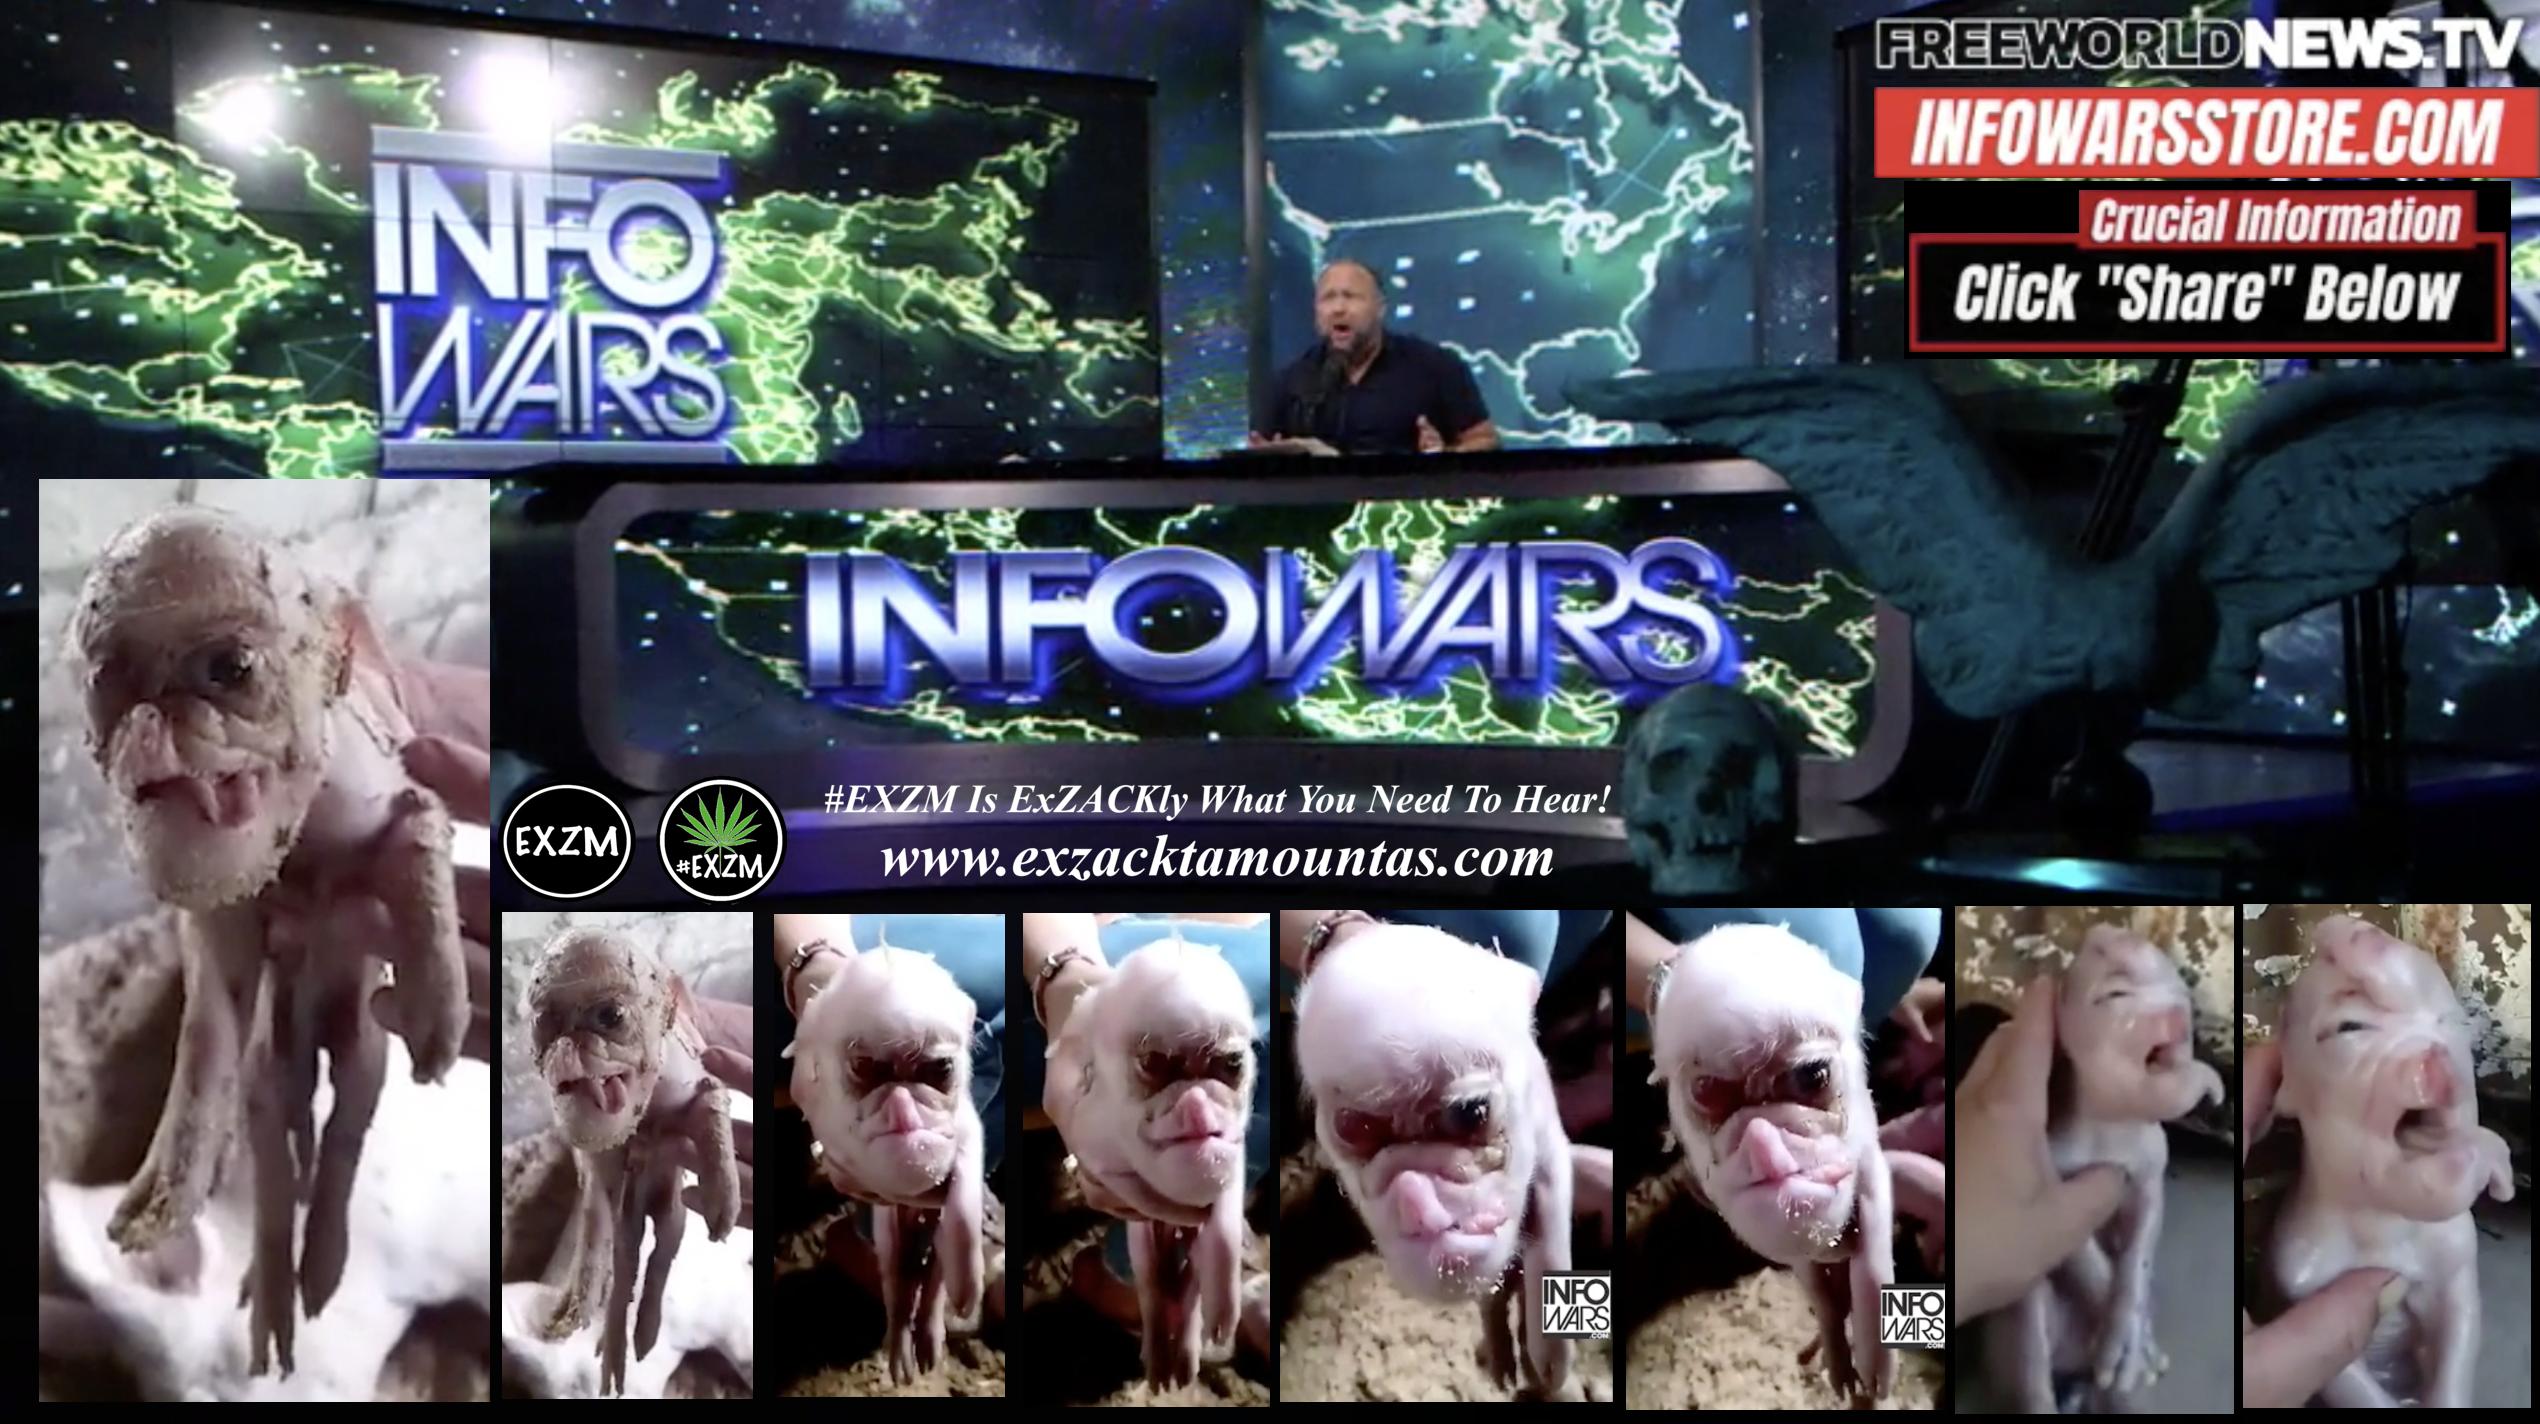 Alex Jones Live In Infowars Studio Human Skull Angel Wings Dagger Human Pig Hybrids Free World News TV EXZM Zack Mount October 7th 2021 copy